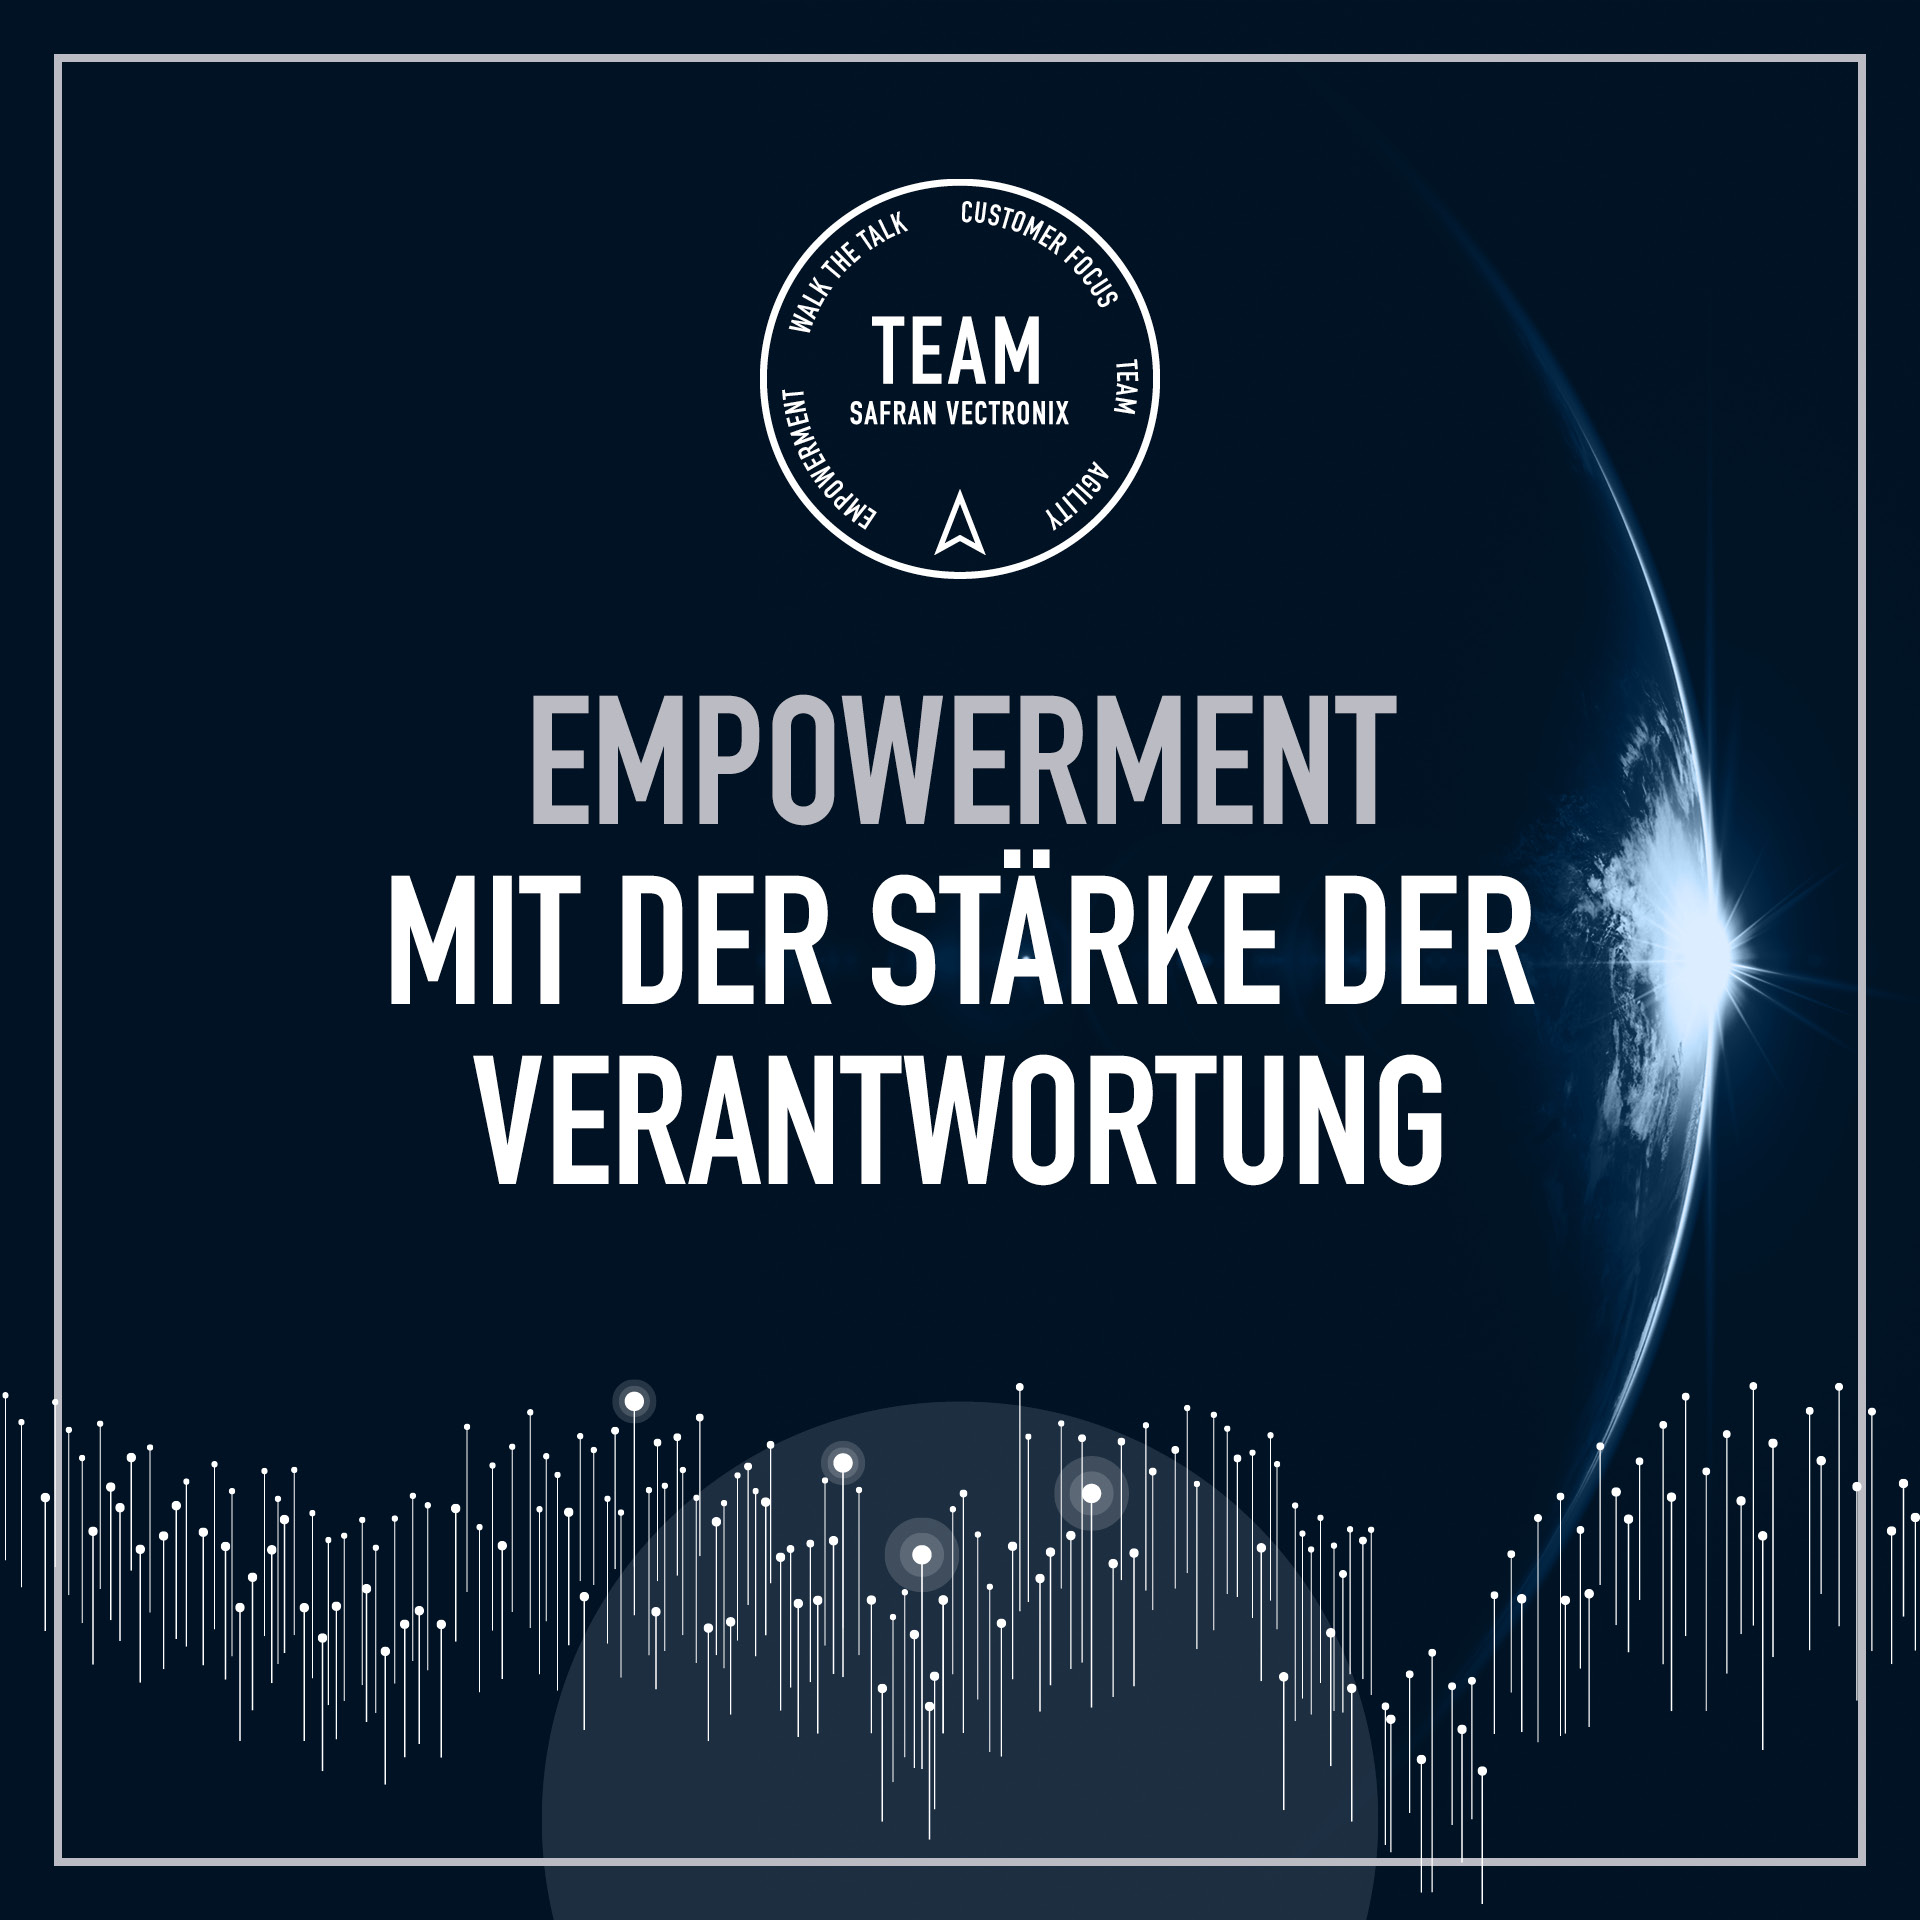 safran vectronix values customer focus empowerment